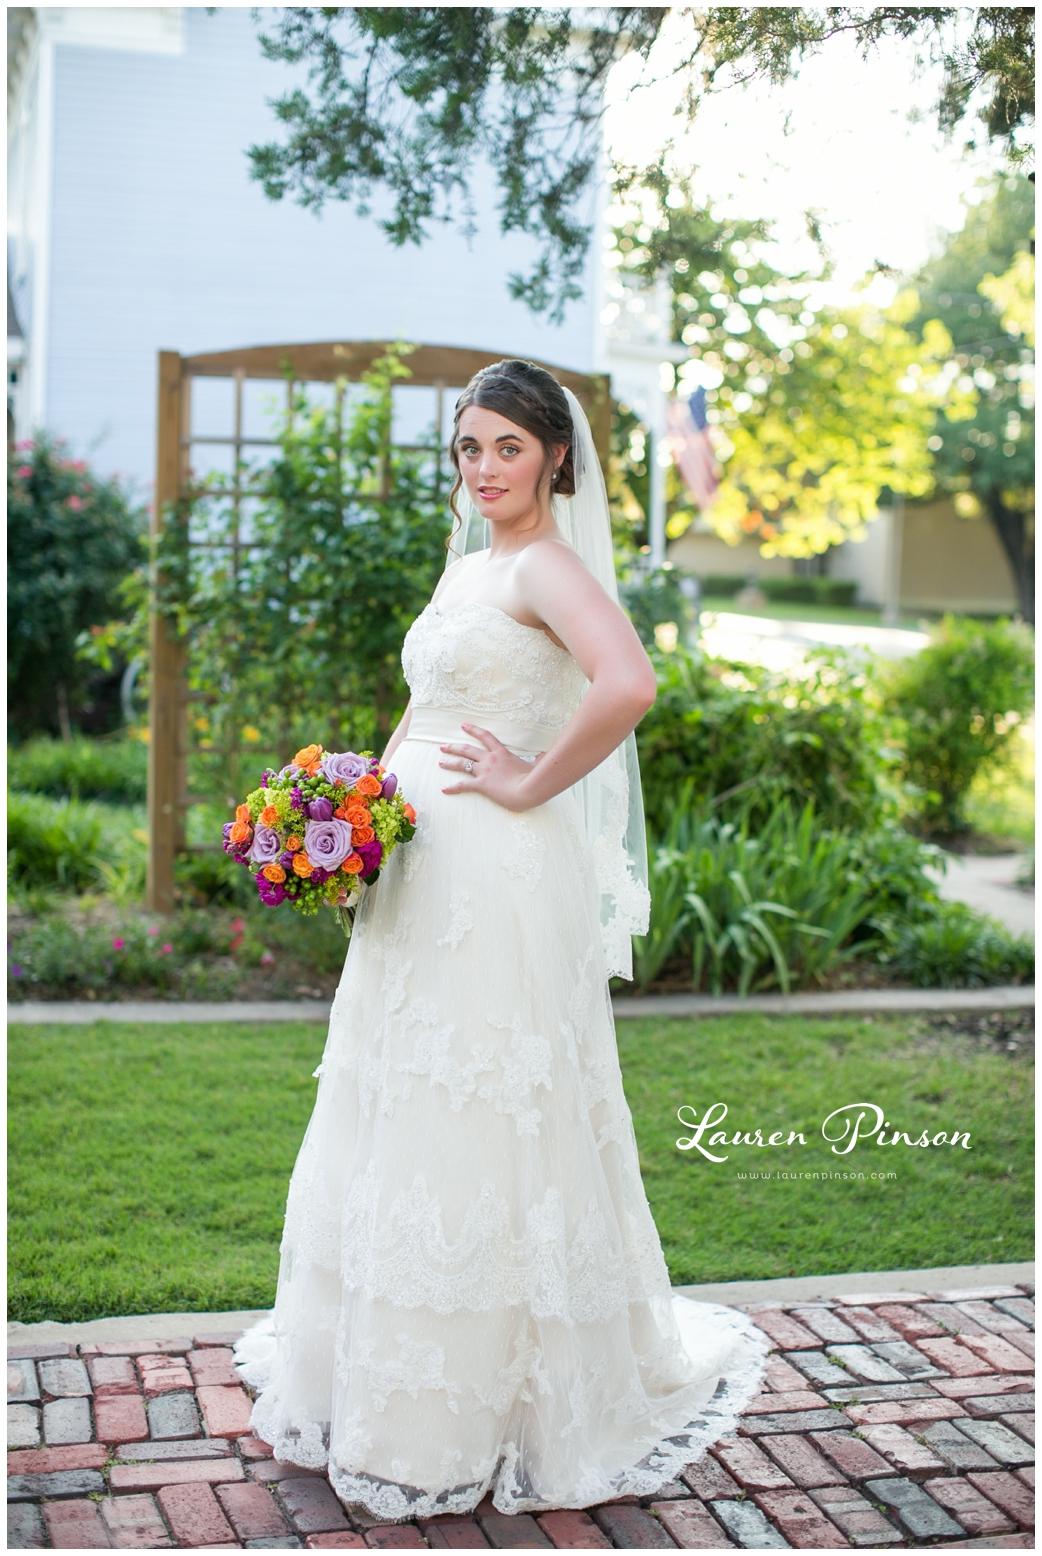 chestnut-square-downtown-mckinney-texas-wedding-photographer-sherman-northtexas-bridal-portraits-photography_0220.jpg